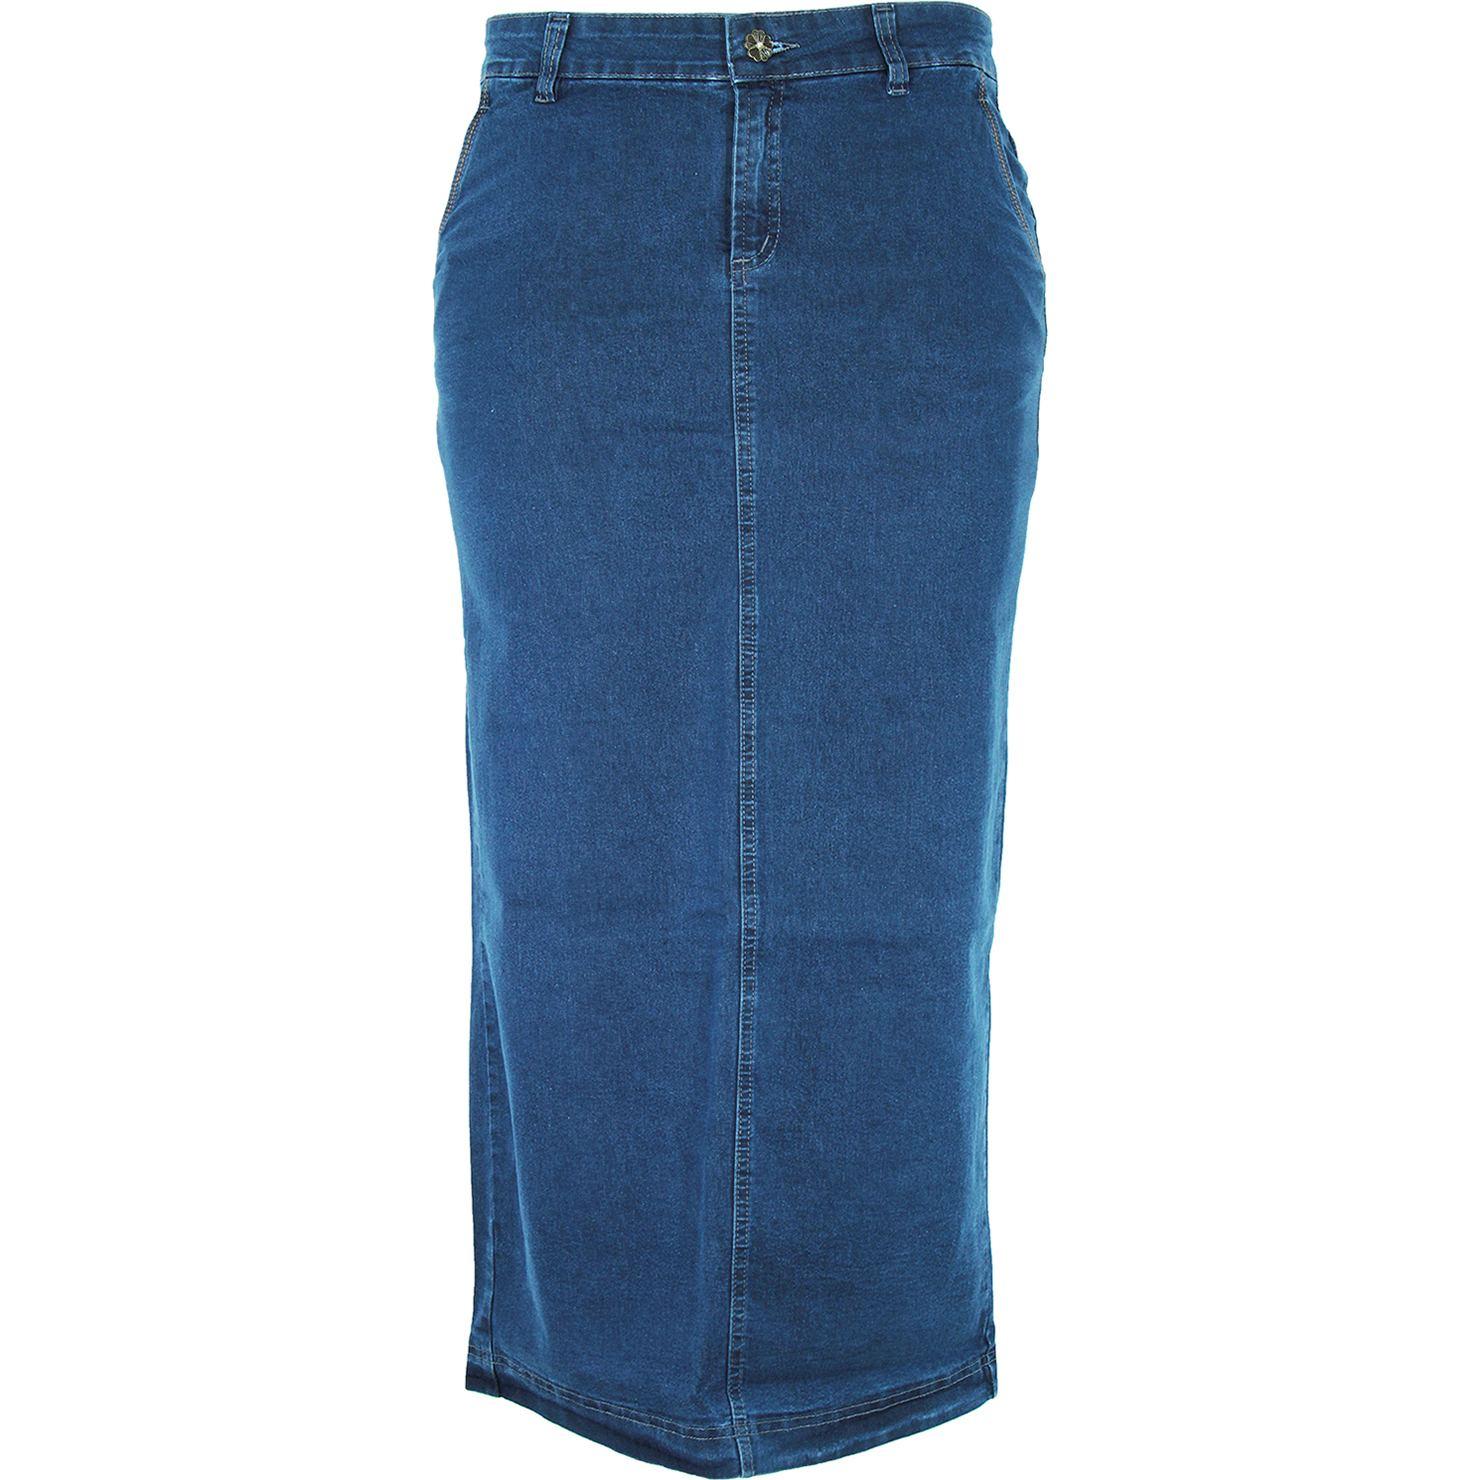 Saia Longa Eruption Jeans Botões [7802ST]